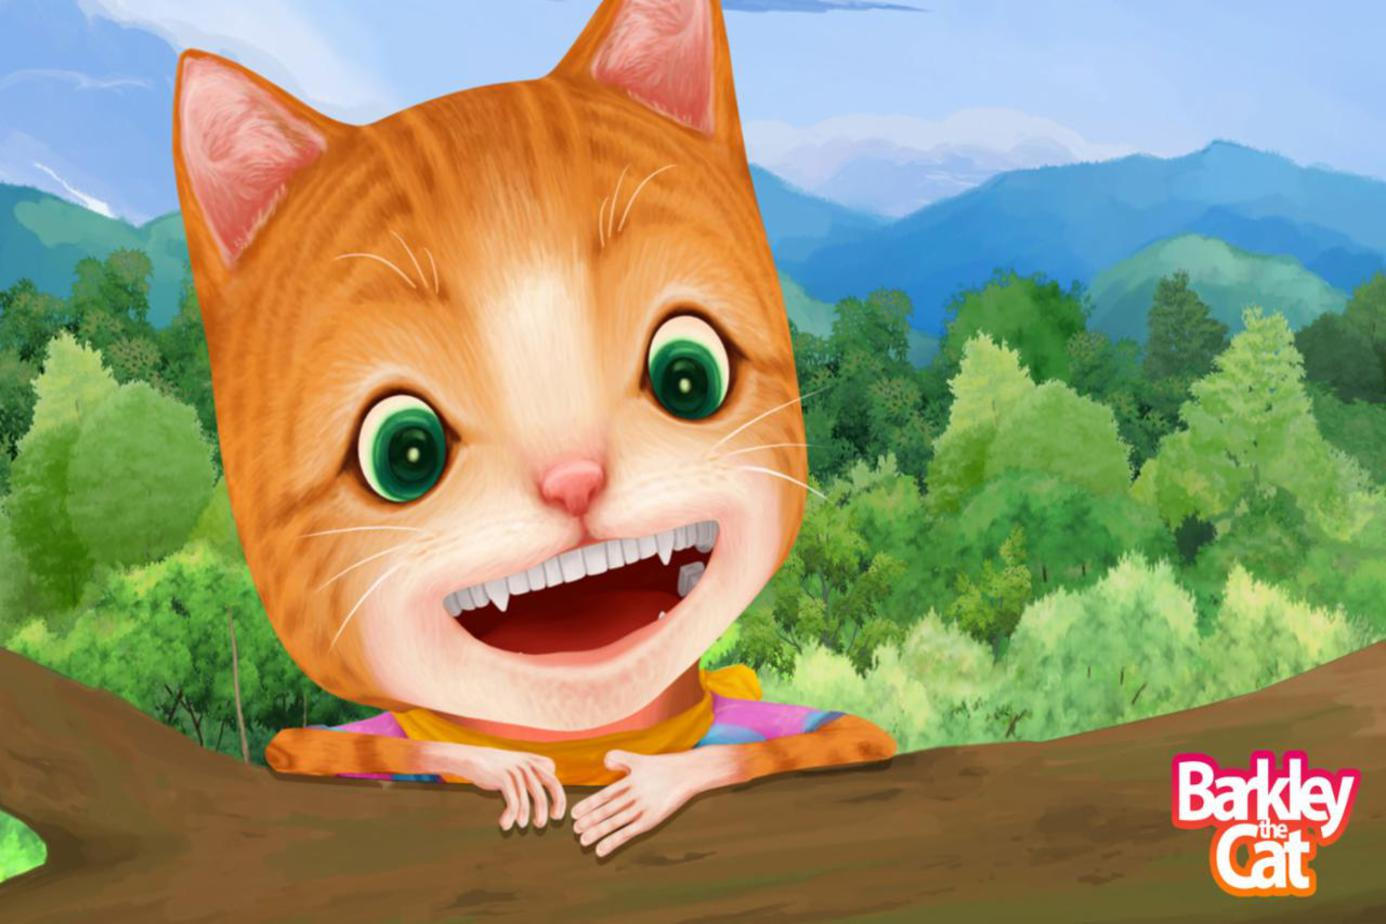 小貓巴克里